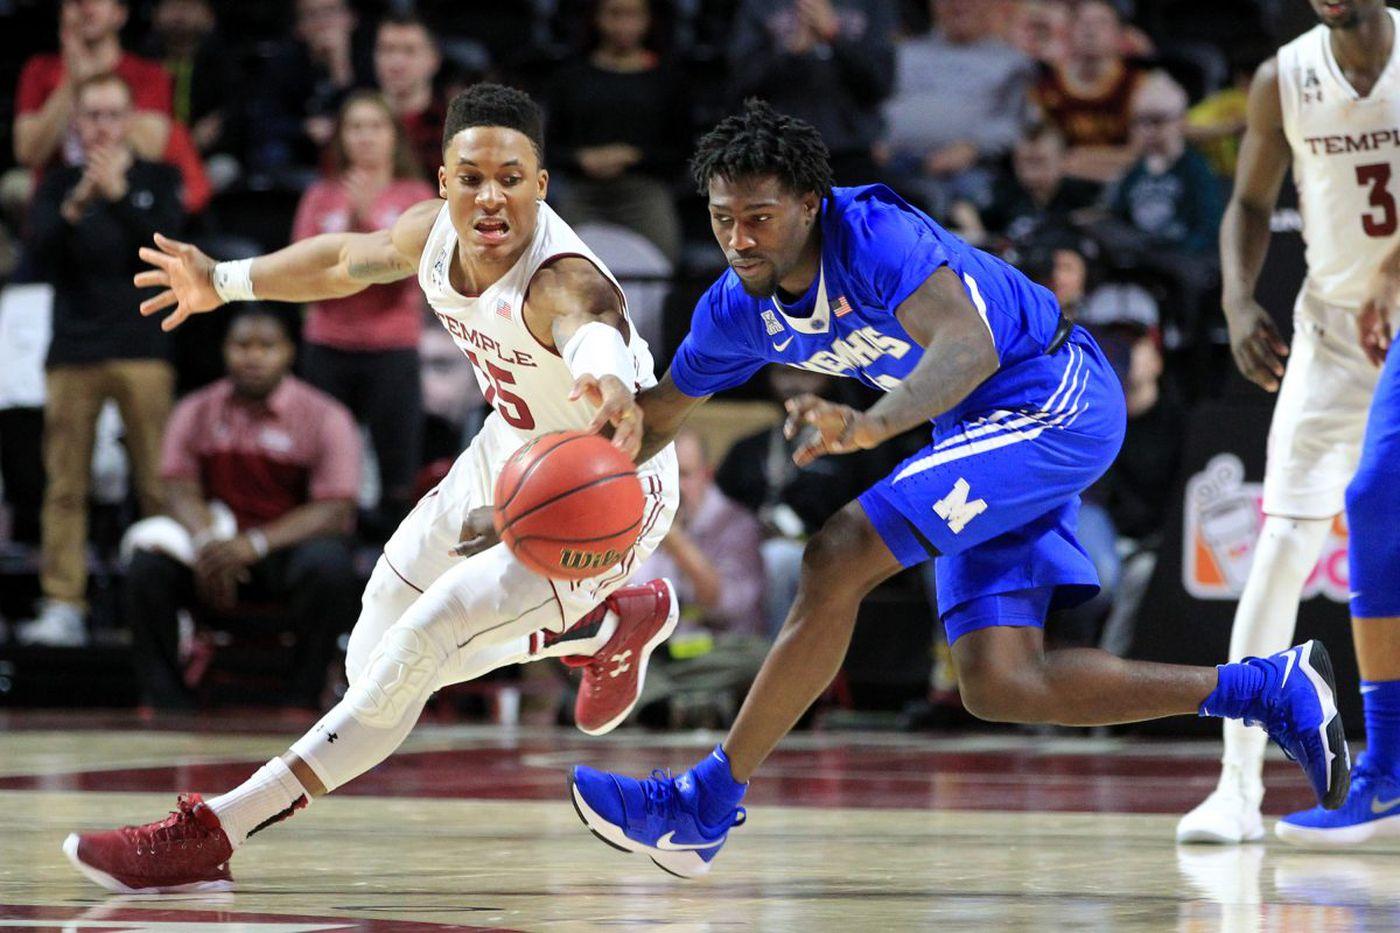 Villanova steps up its defense, Temple freshman Nate Pierre-Louis emerges | Local college basketball roundup